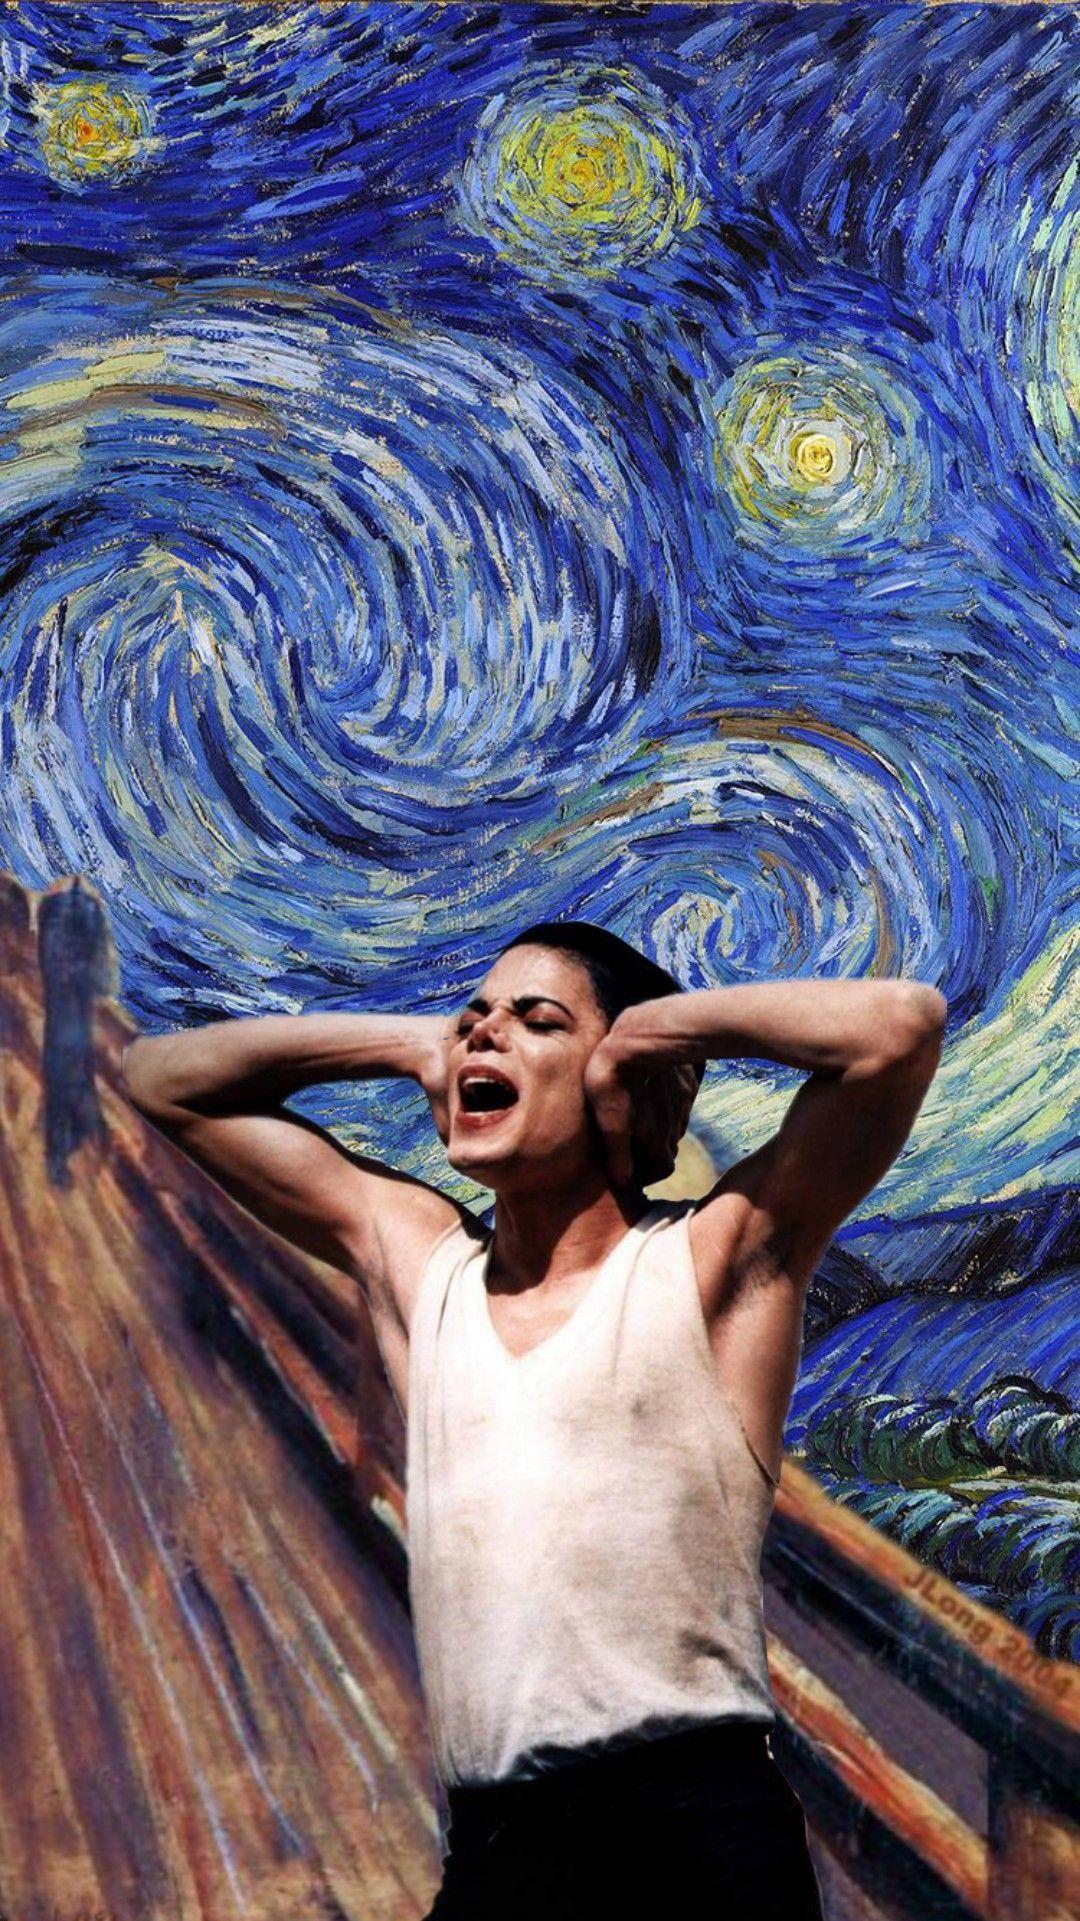 screaming night #michaeljackson Michael Jackson #michaeljackson